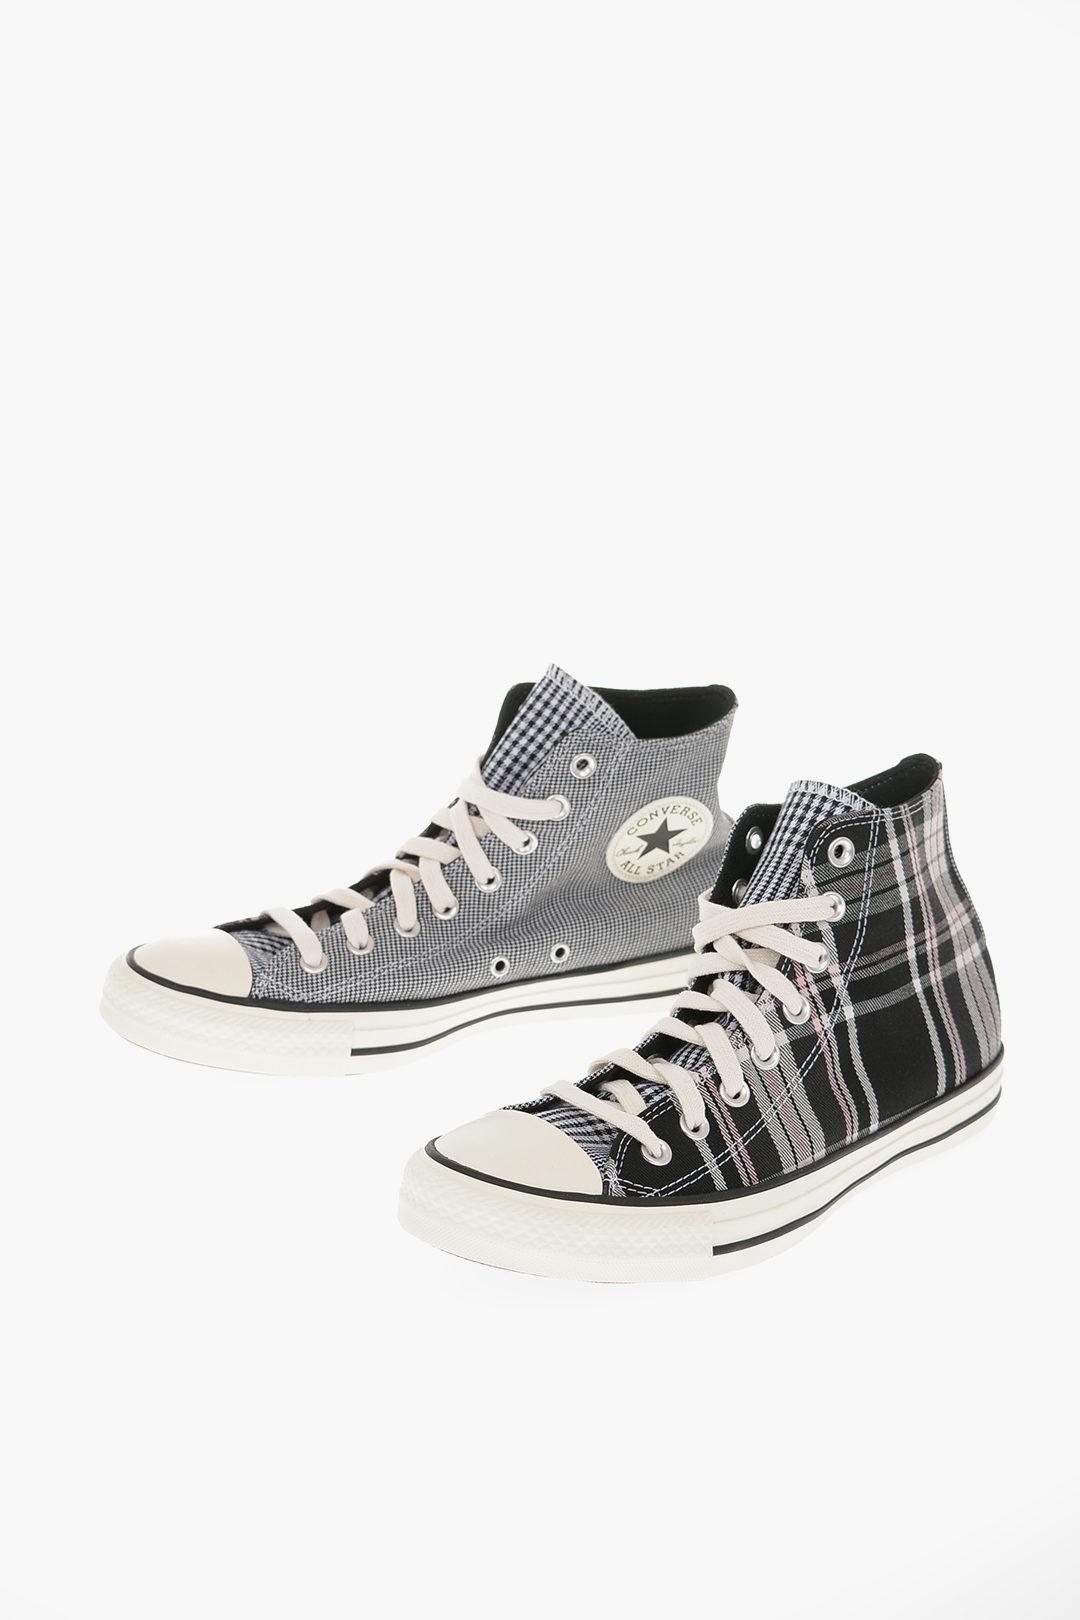 CHUCK TAYLOR ALL STAR High-top Sneakers Pied de Poule e a quadri tartan